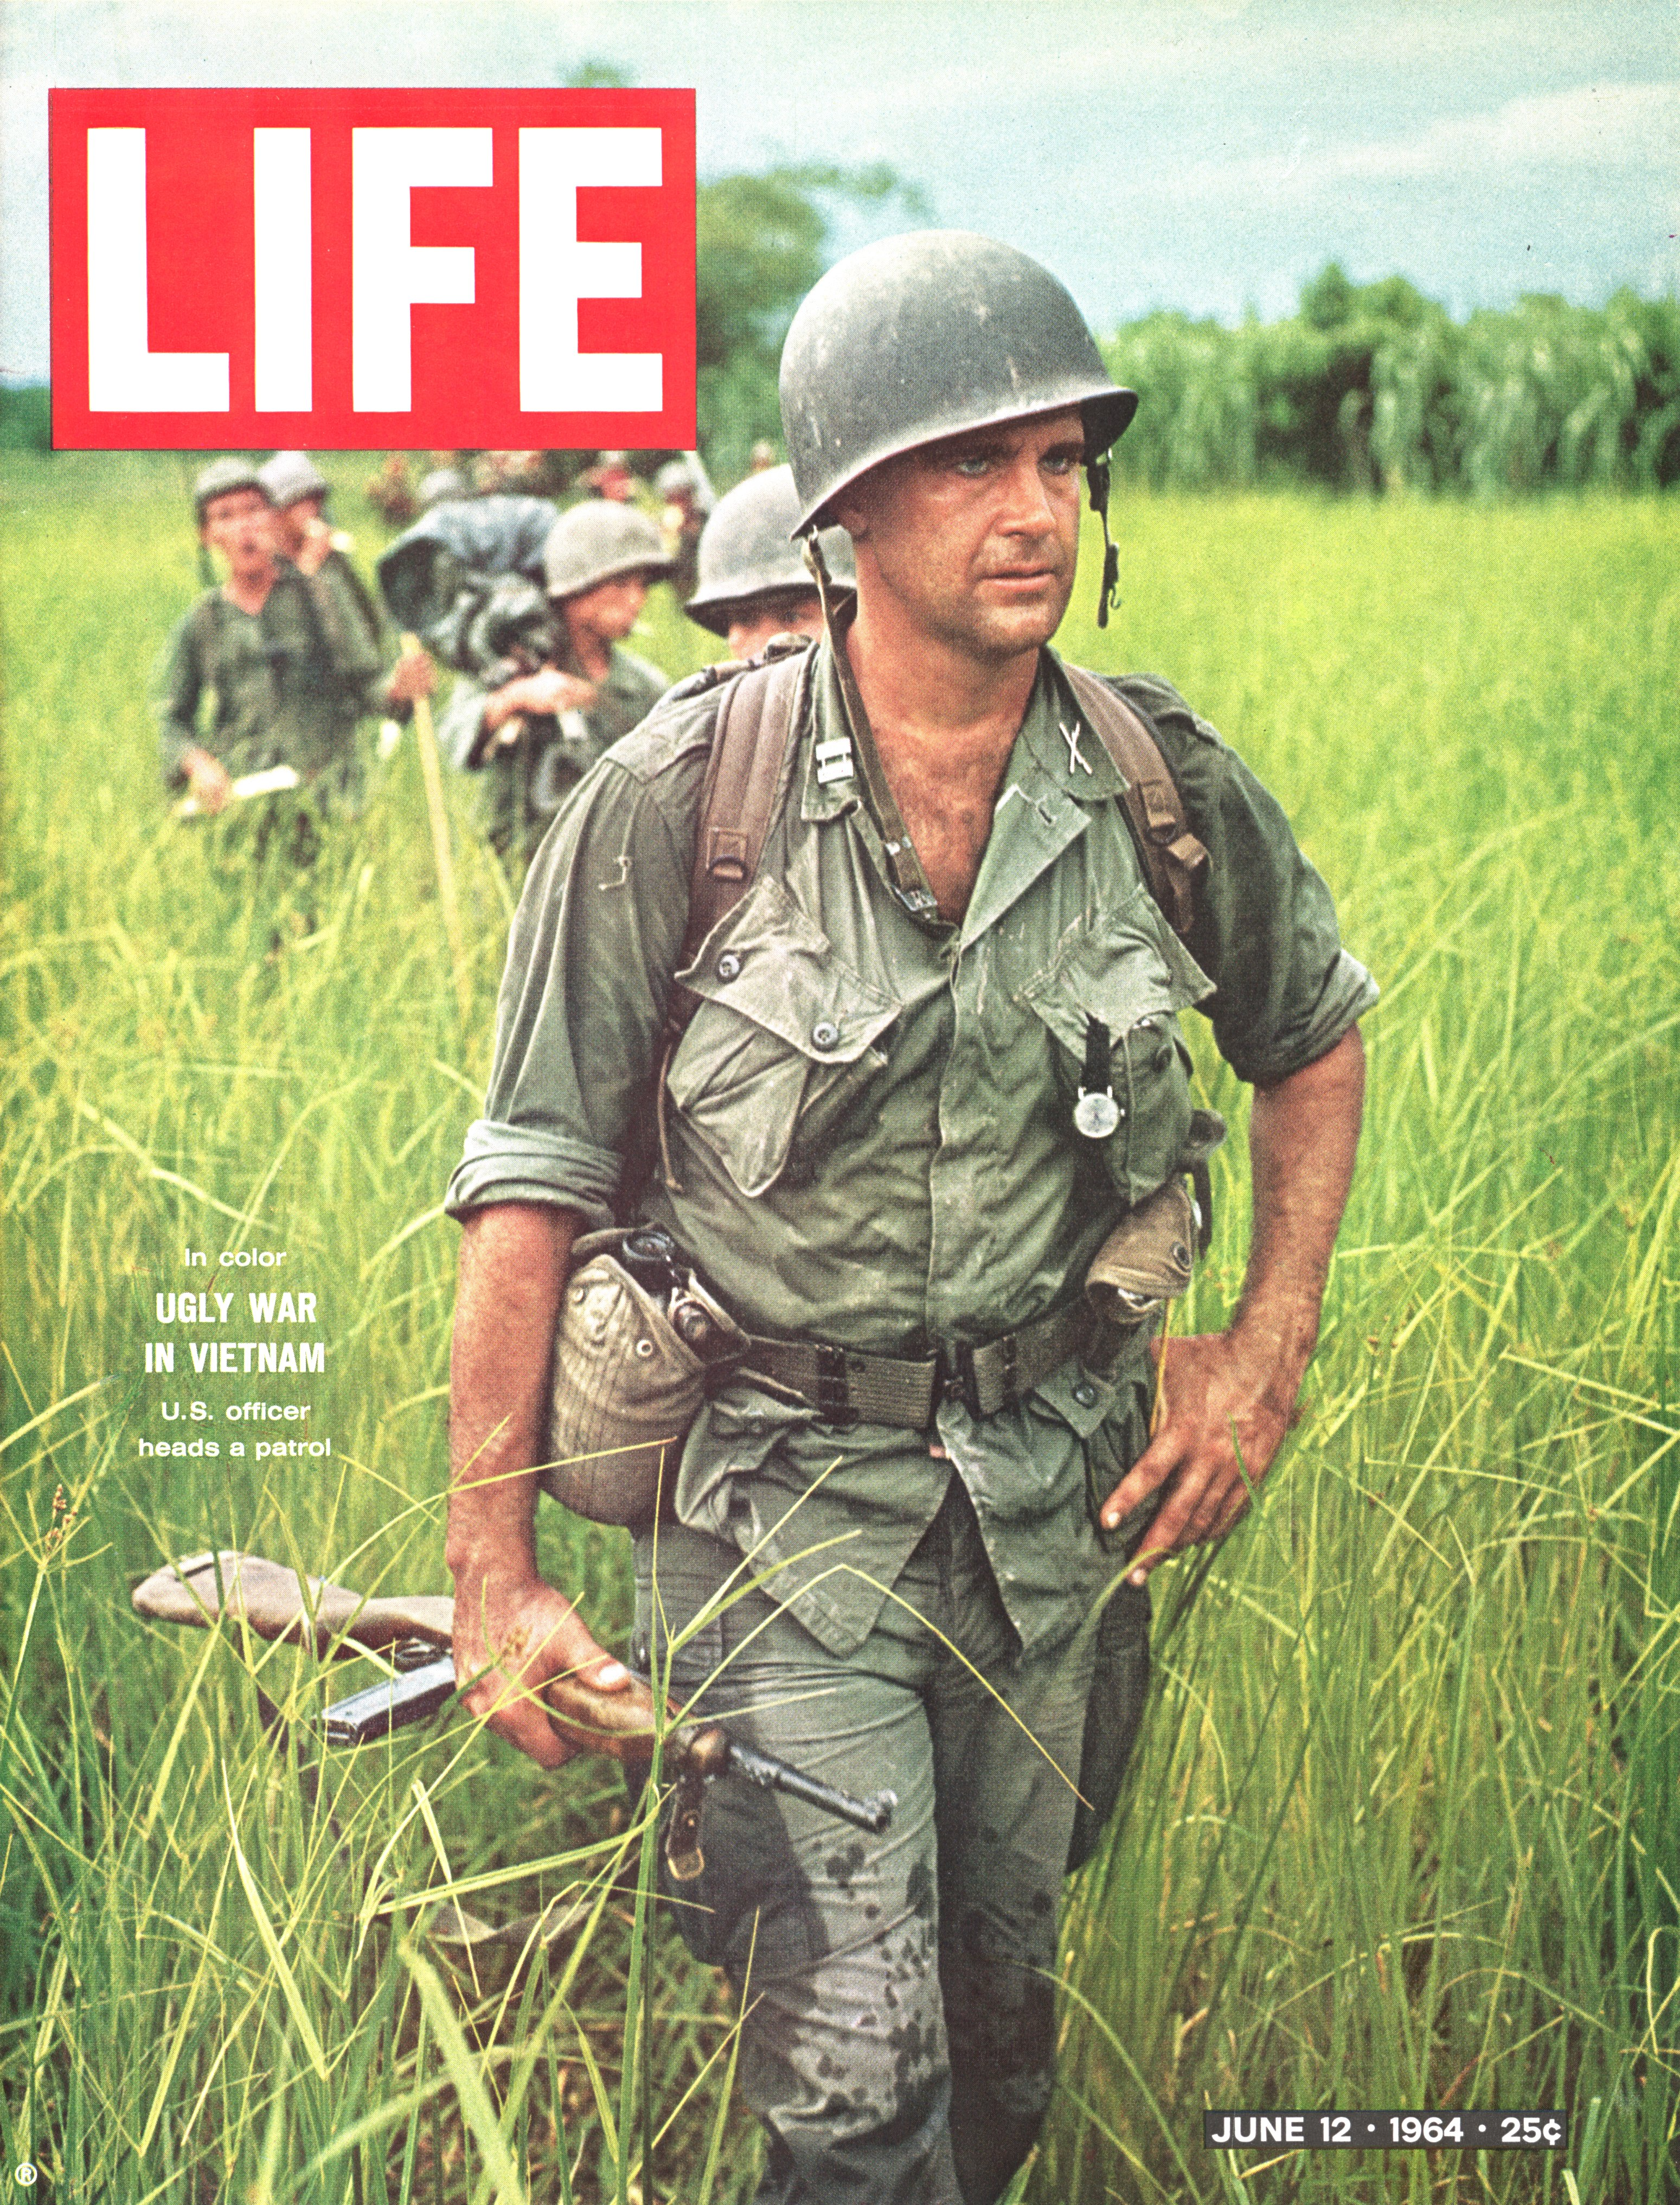 Vietnam 66-67 helmet clipart svg stock Vietnam War: LIFE Magazine Covers From the Era-Defining ... svg stock